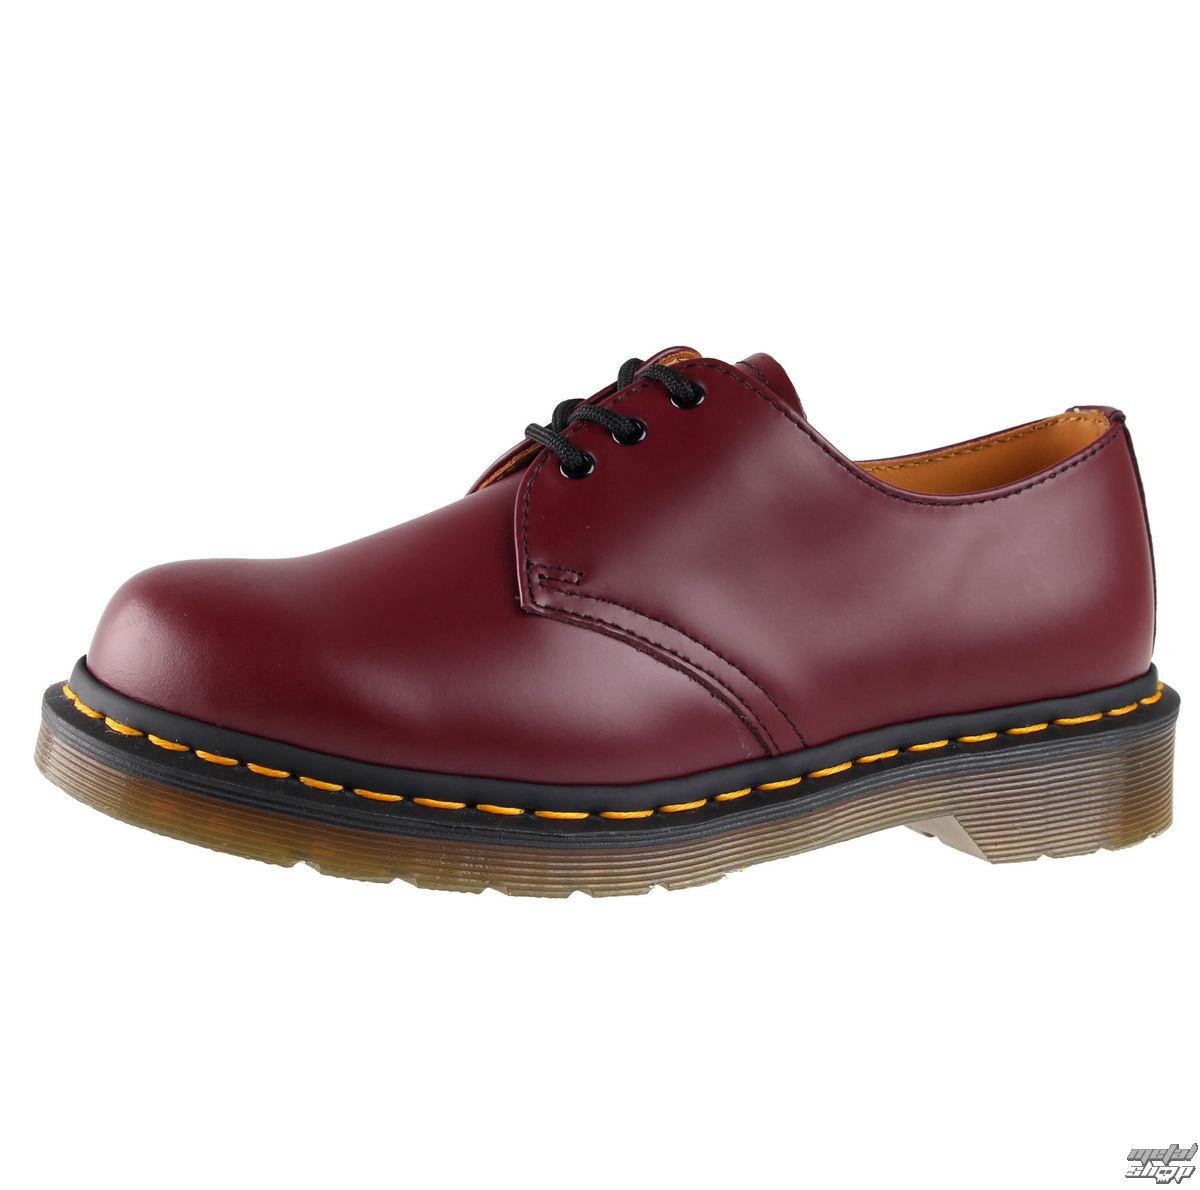 boty Dr. Martens - 3 dírkové - DM 1461 59 - CHERRY RED SMOOTH - DM10085600